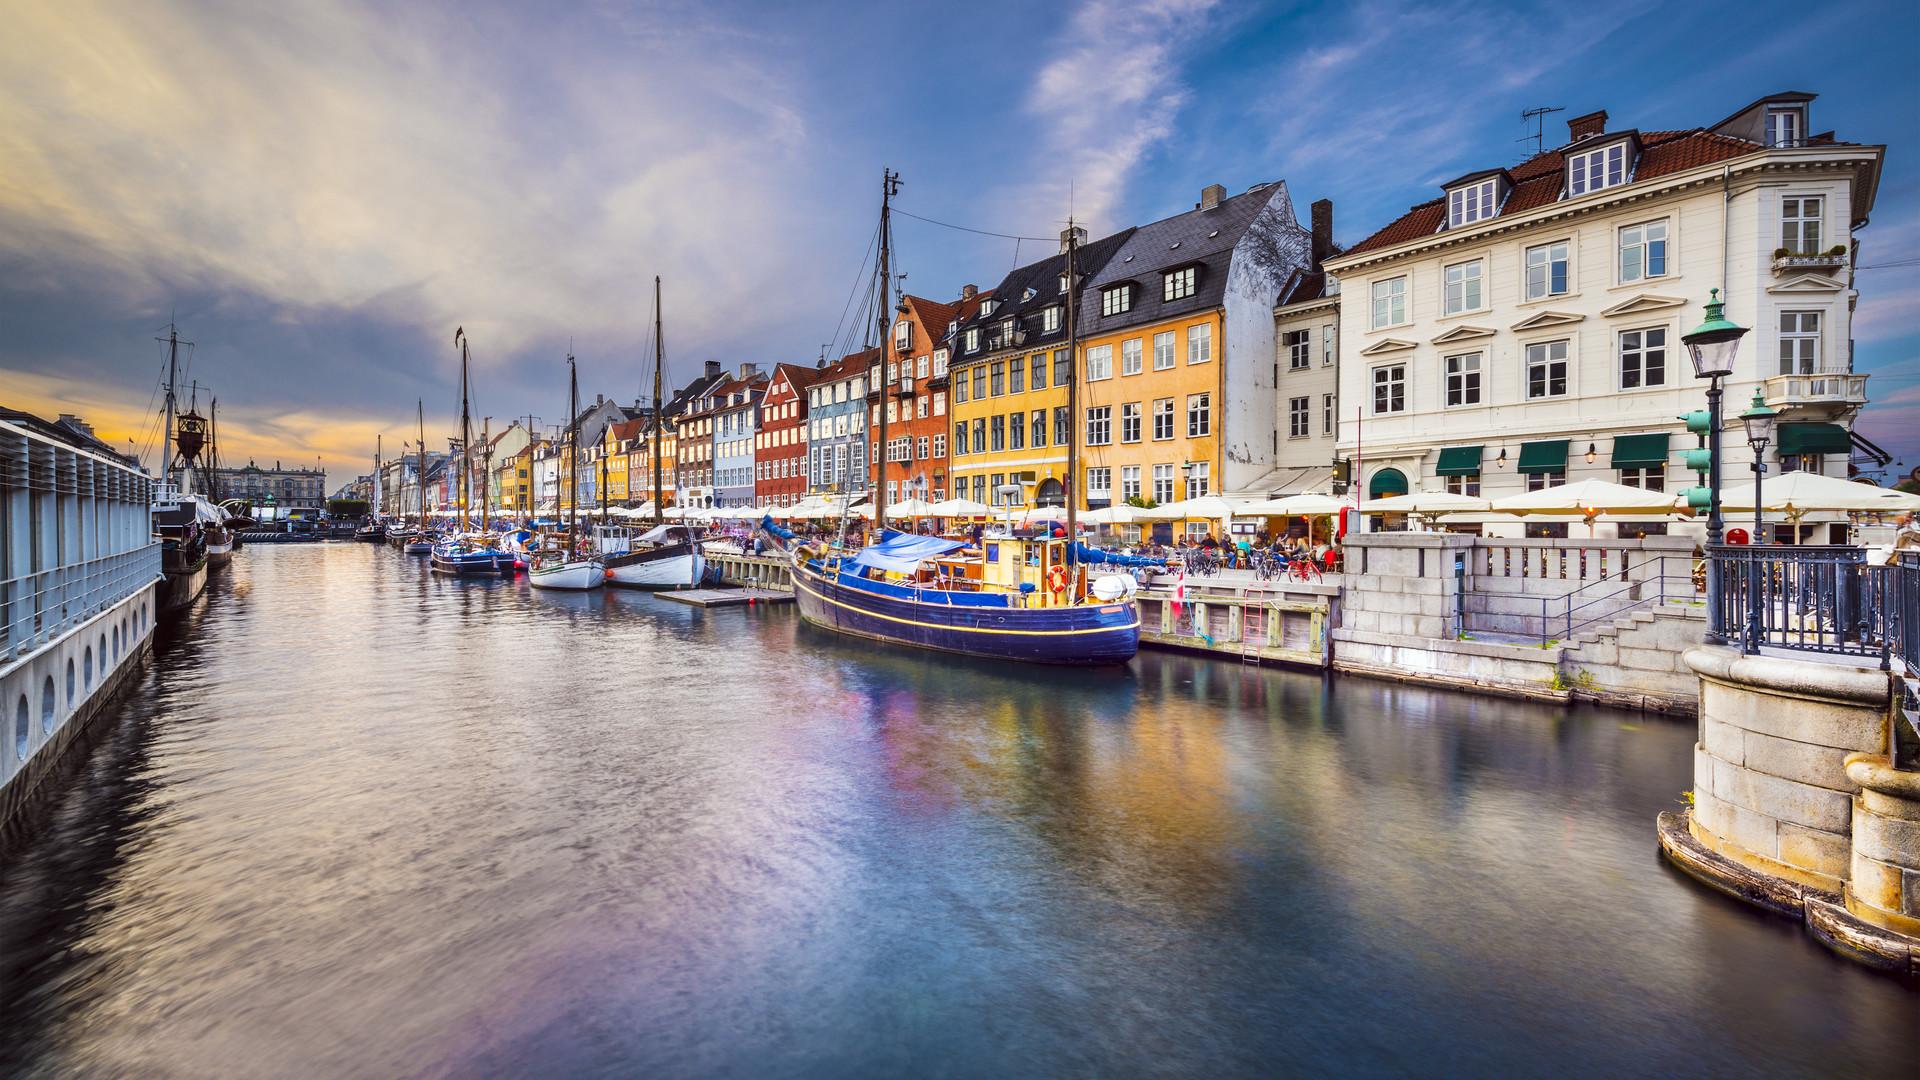 Beautiful winter view from Copenhagen canal   HD wallpaper 1920x1080